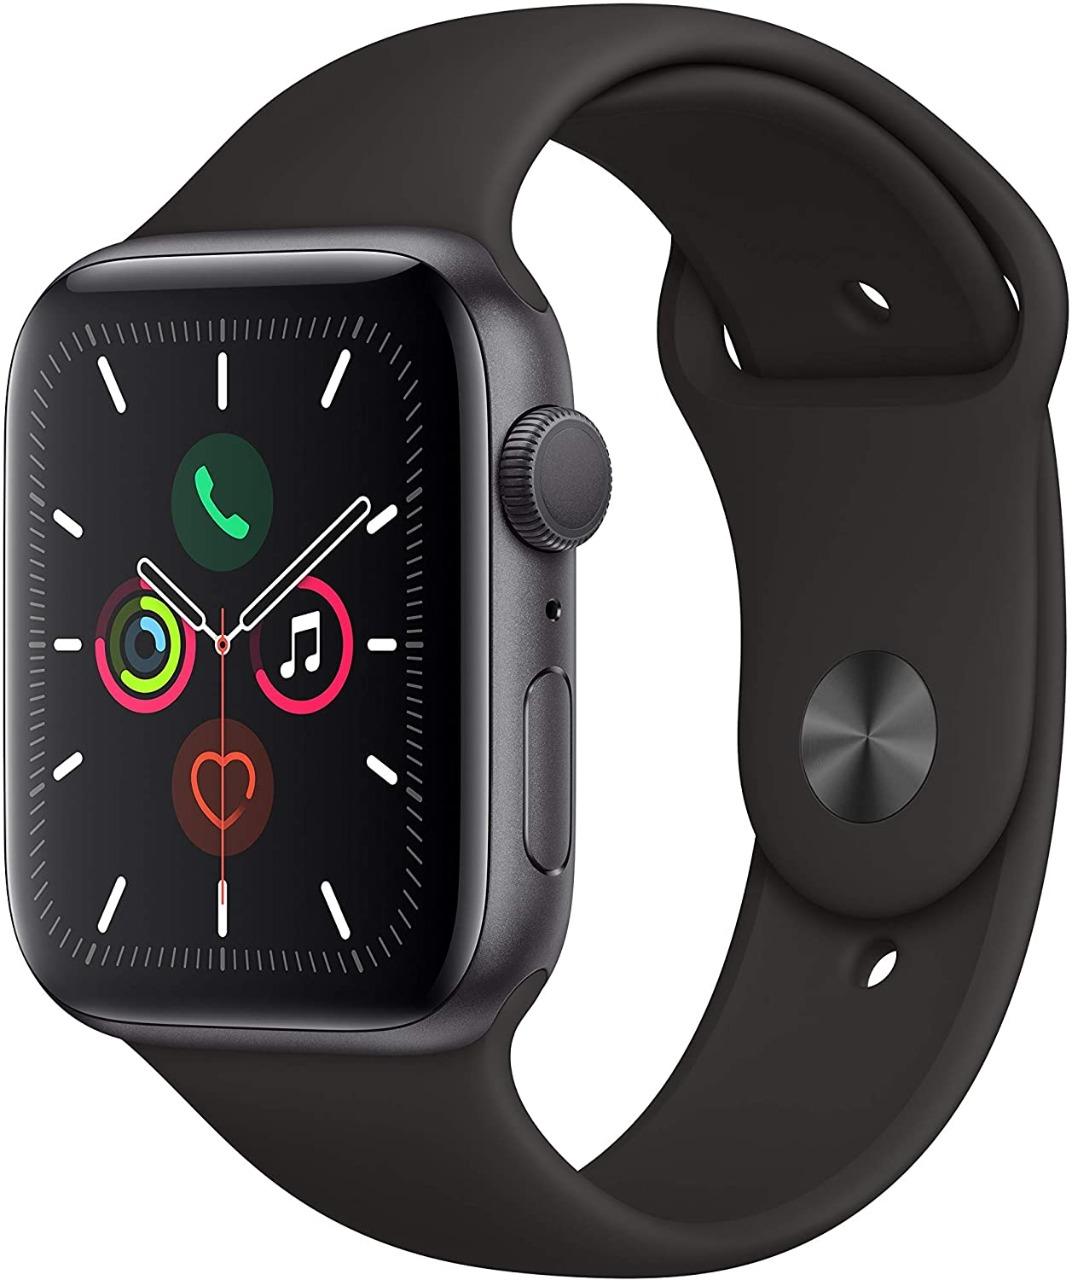 Apple Watch Series 5, Seminovo 44mm, Alumínio Preto